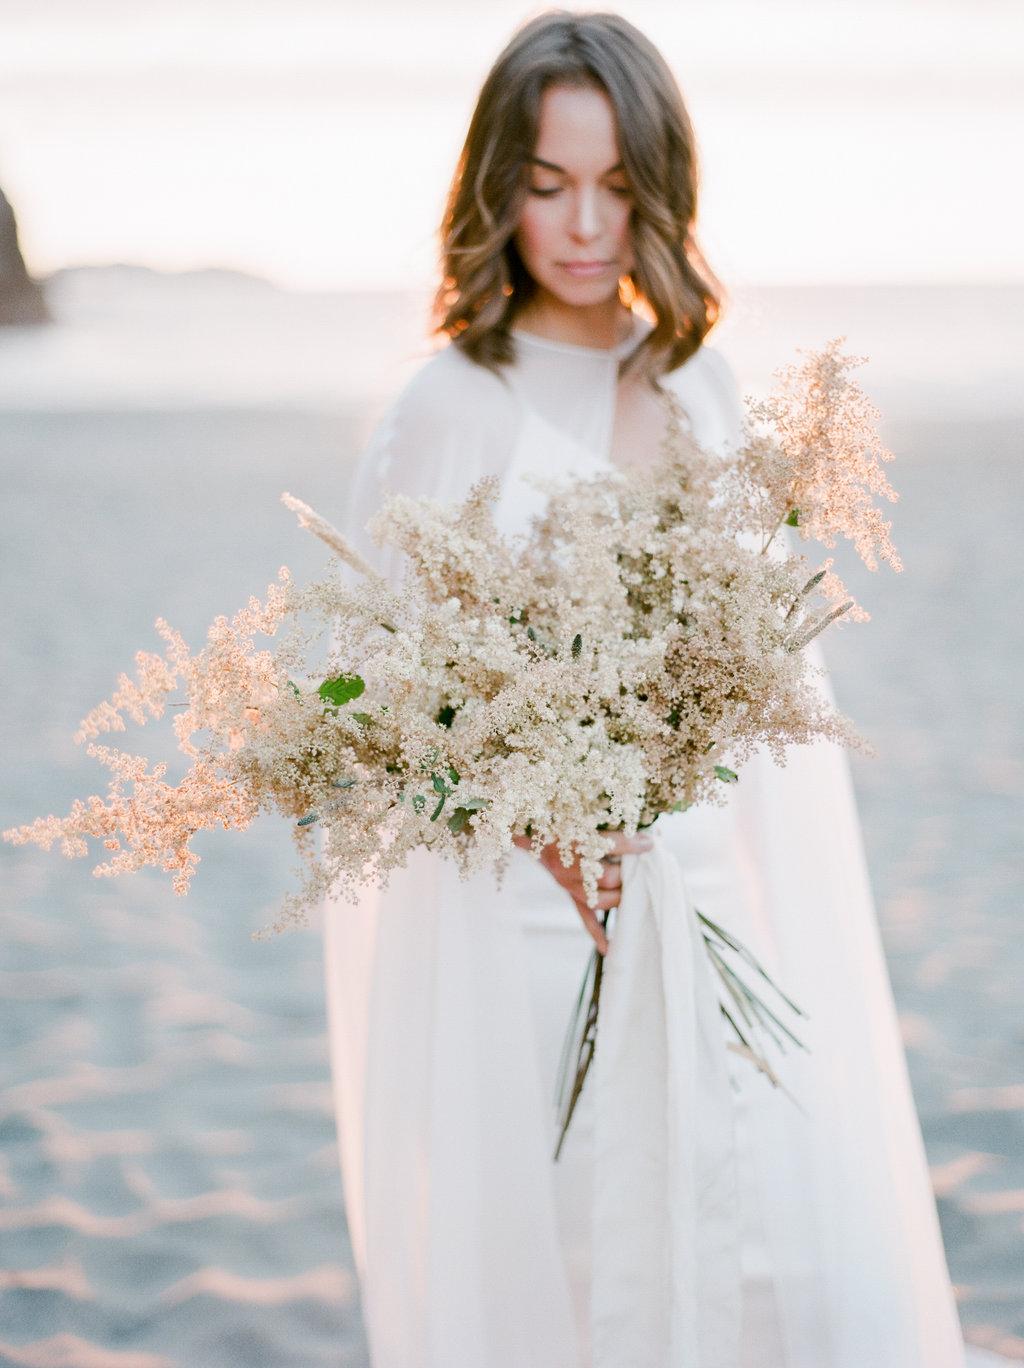 California Beach Wedding | Beach Wedding | Minimalist Wedding | Madalina Sheldon | Anda Ambrosini | Fine Art Wedding Blog | Canadian Wedding Blog | Joy Wed